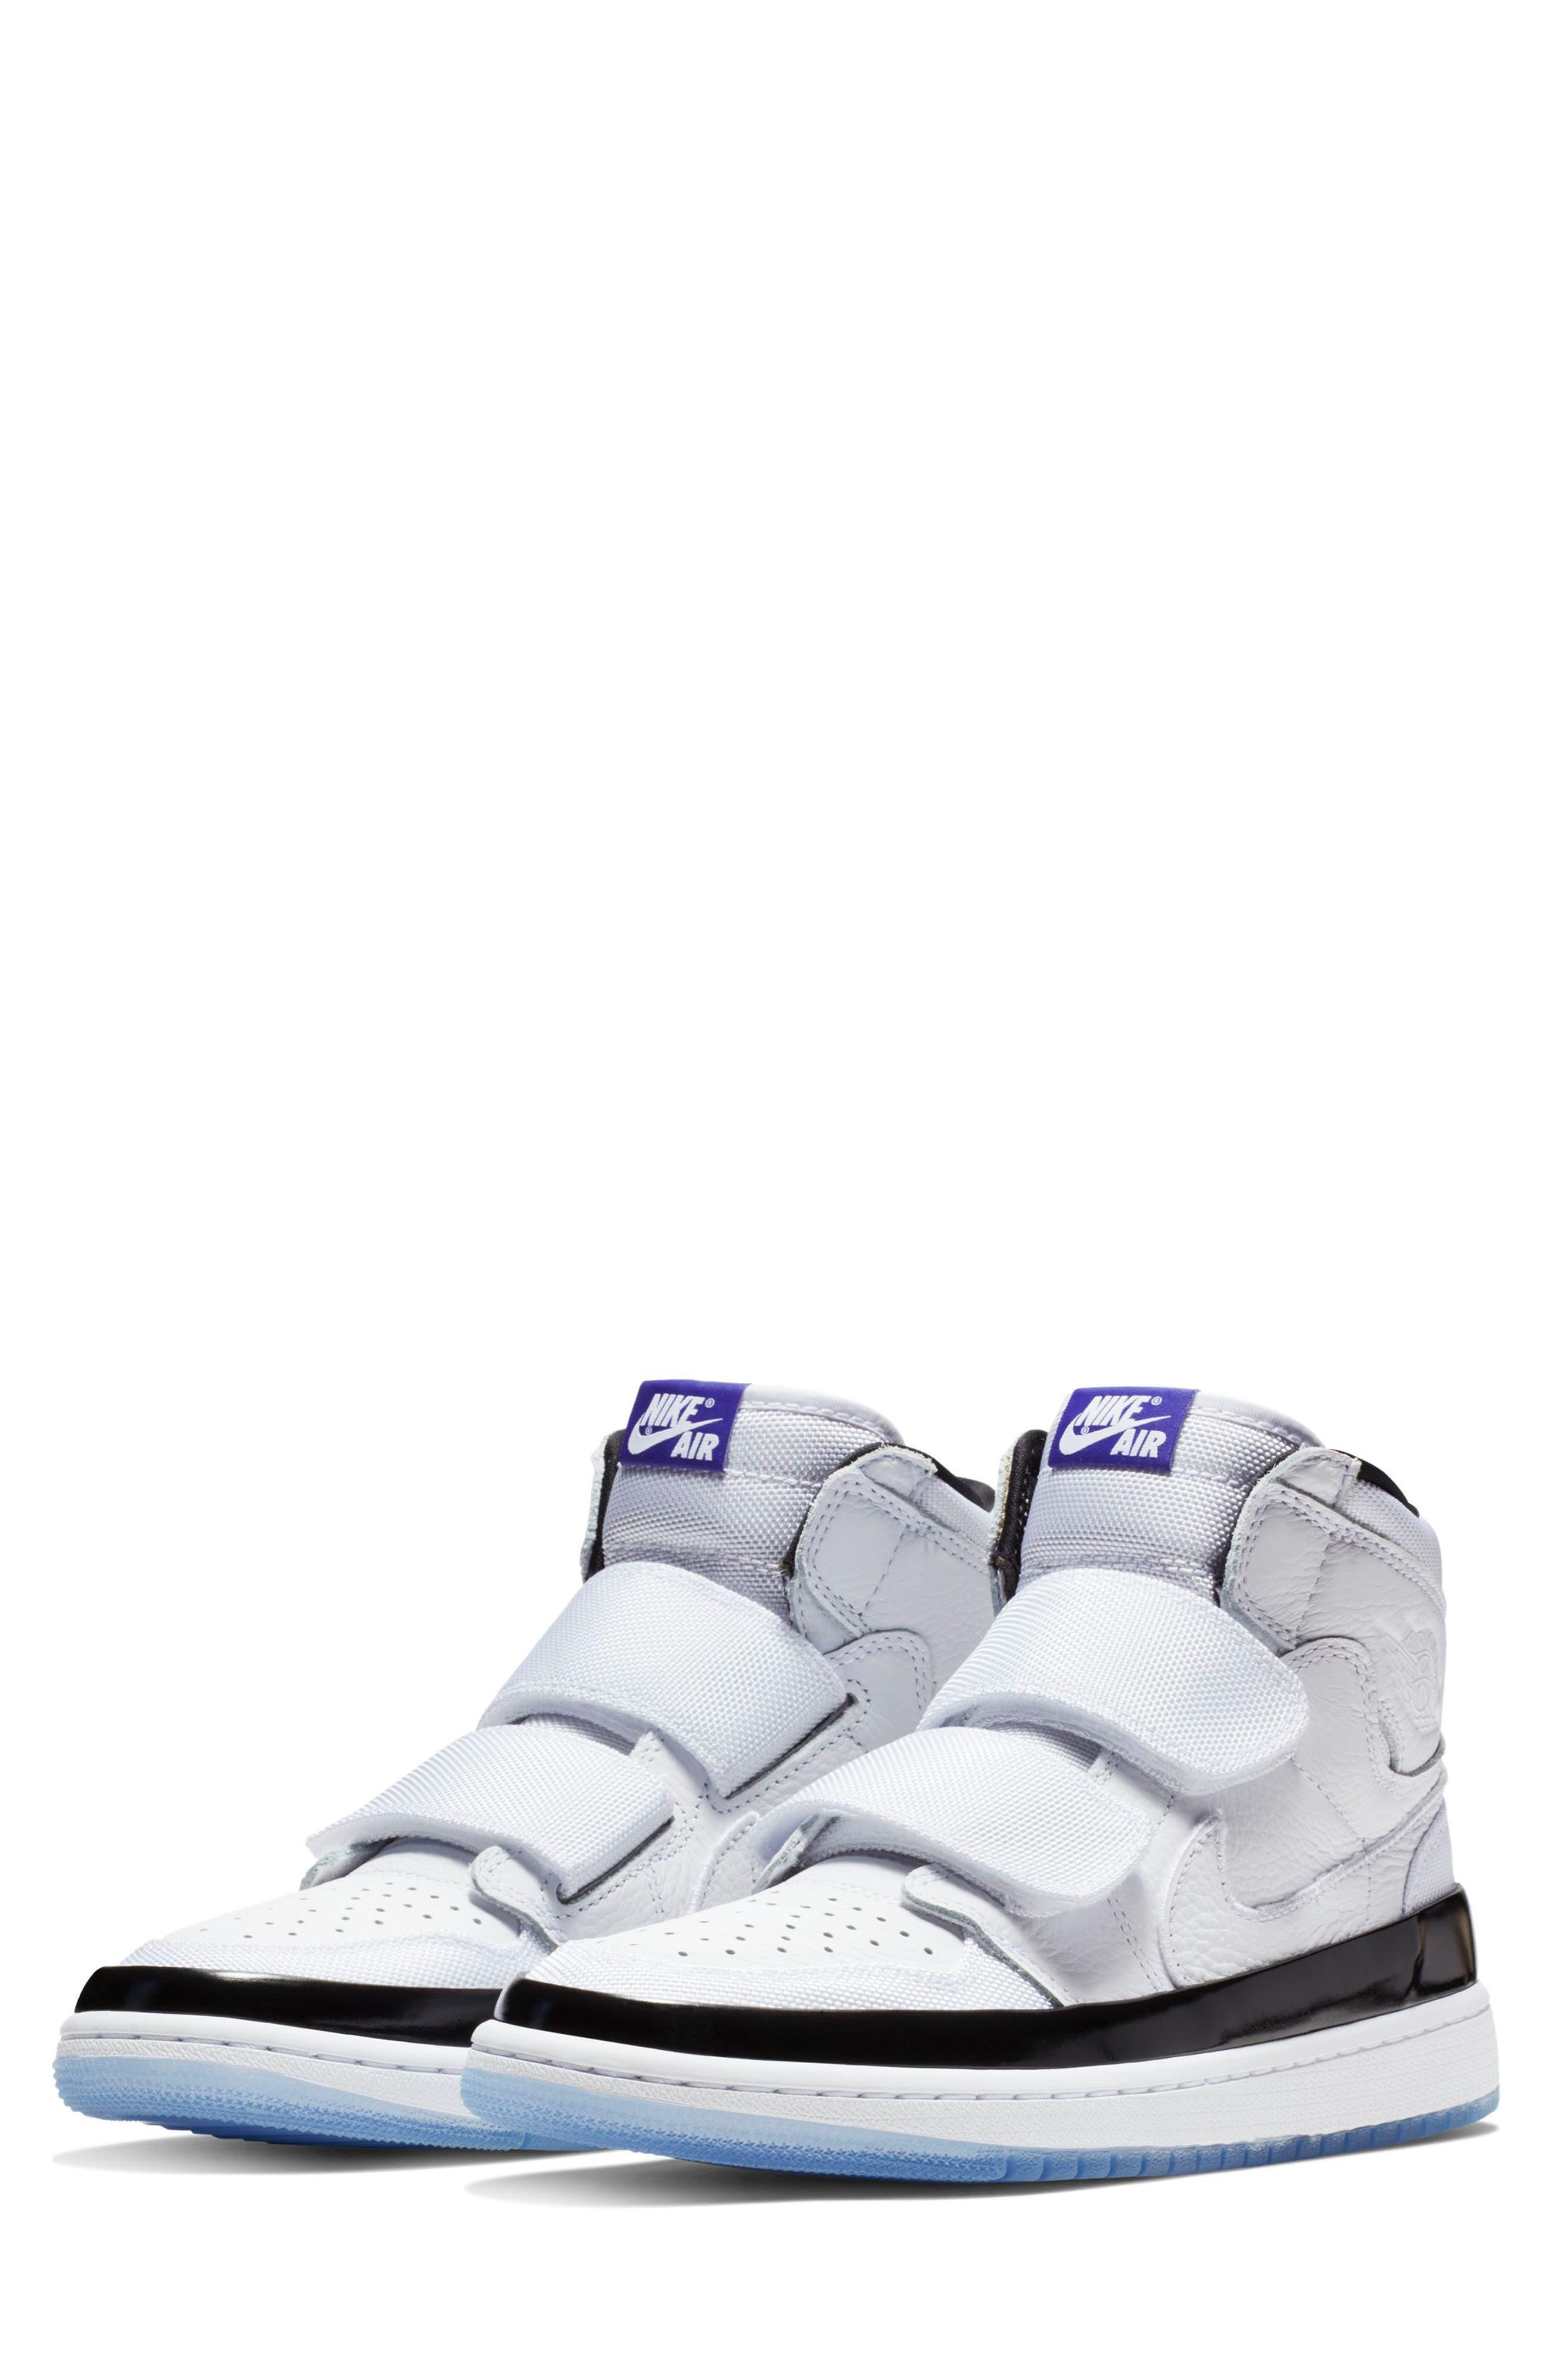 Air Jordan 1 Retro High Double Strap Sneaker,                             Main thumbnail 1, color,                             WHITE/ DARK CONCORD/ BLACK